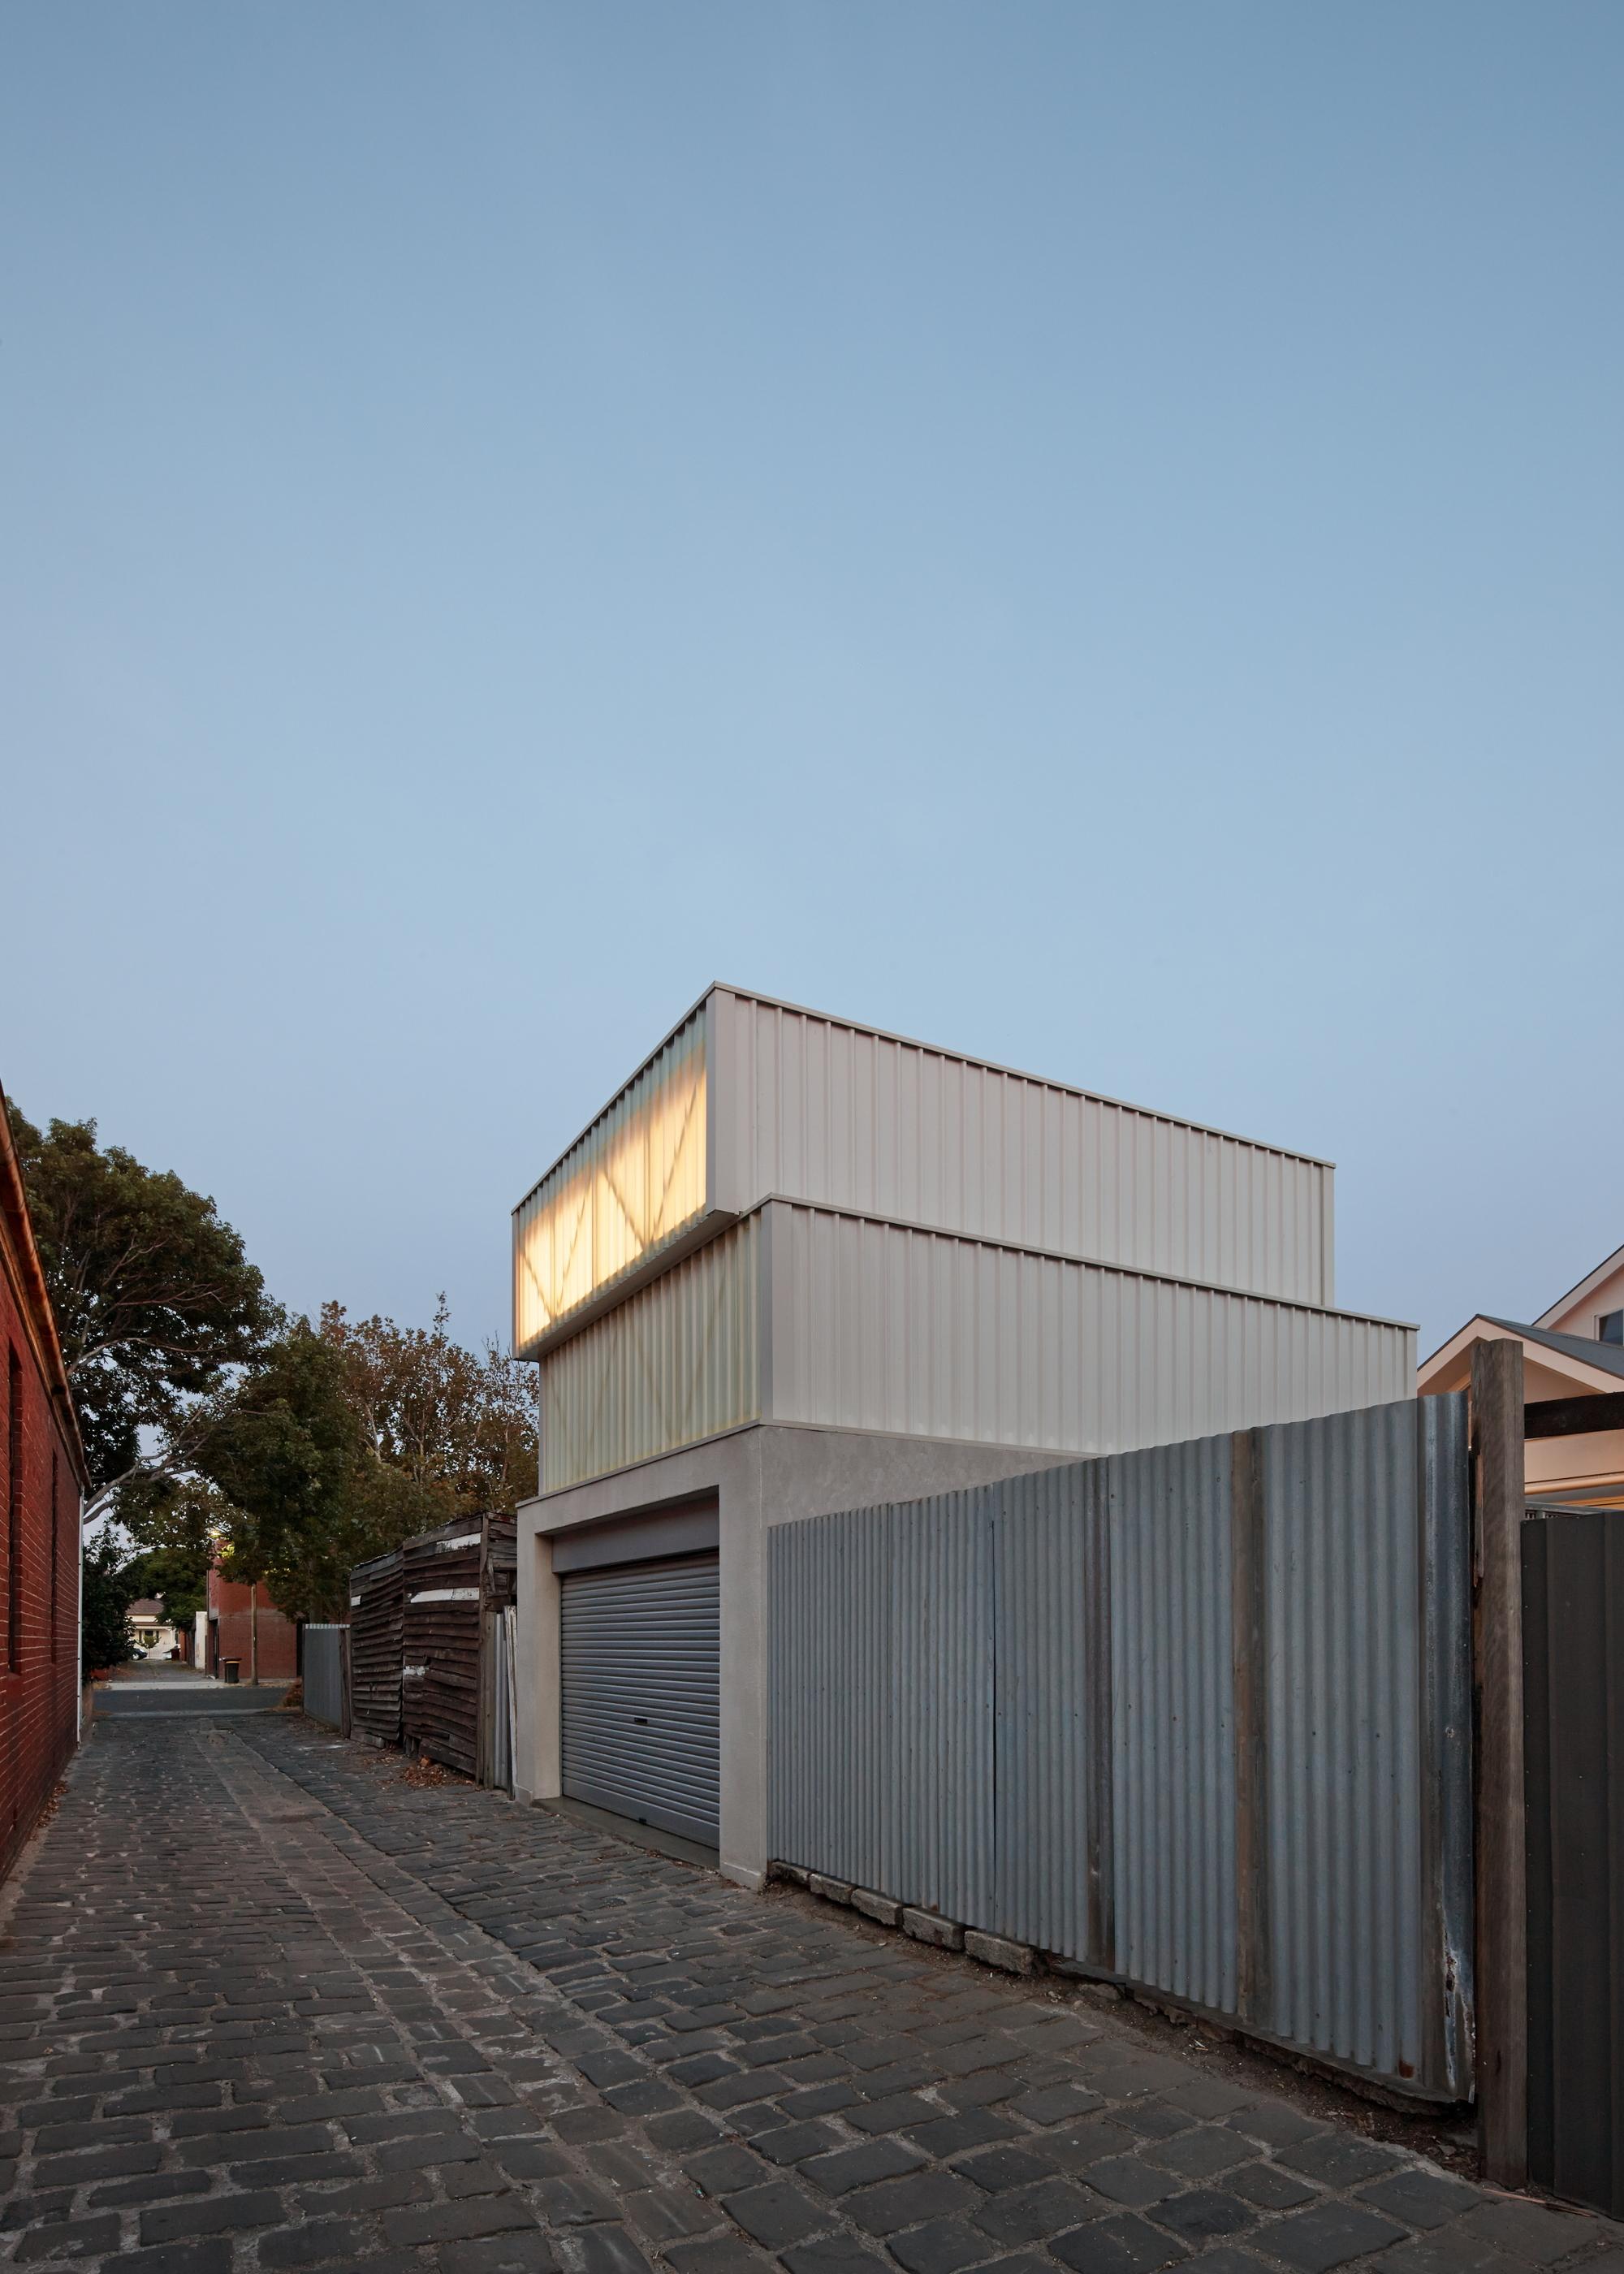 Middle Park Studio by John-Paul Rollo Architects (via Lunchbox Architect)